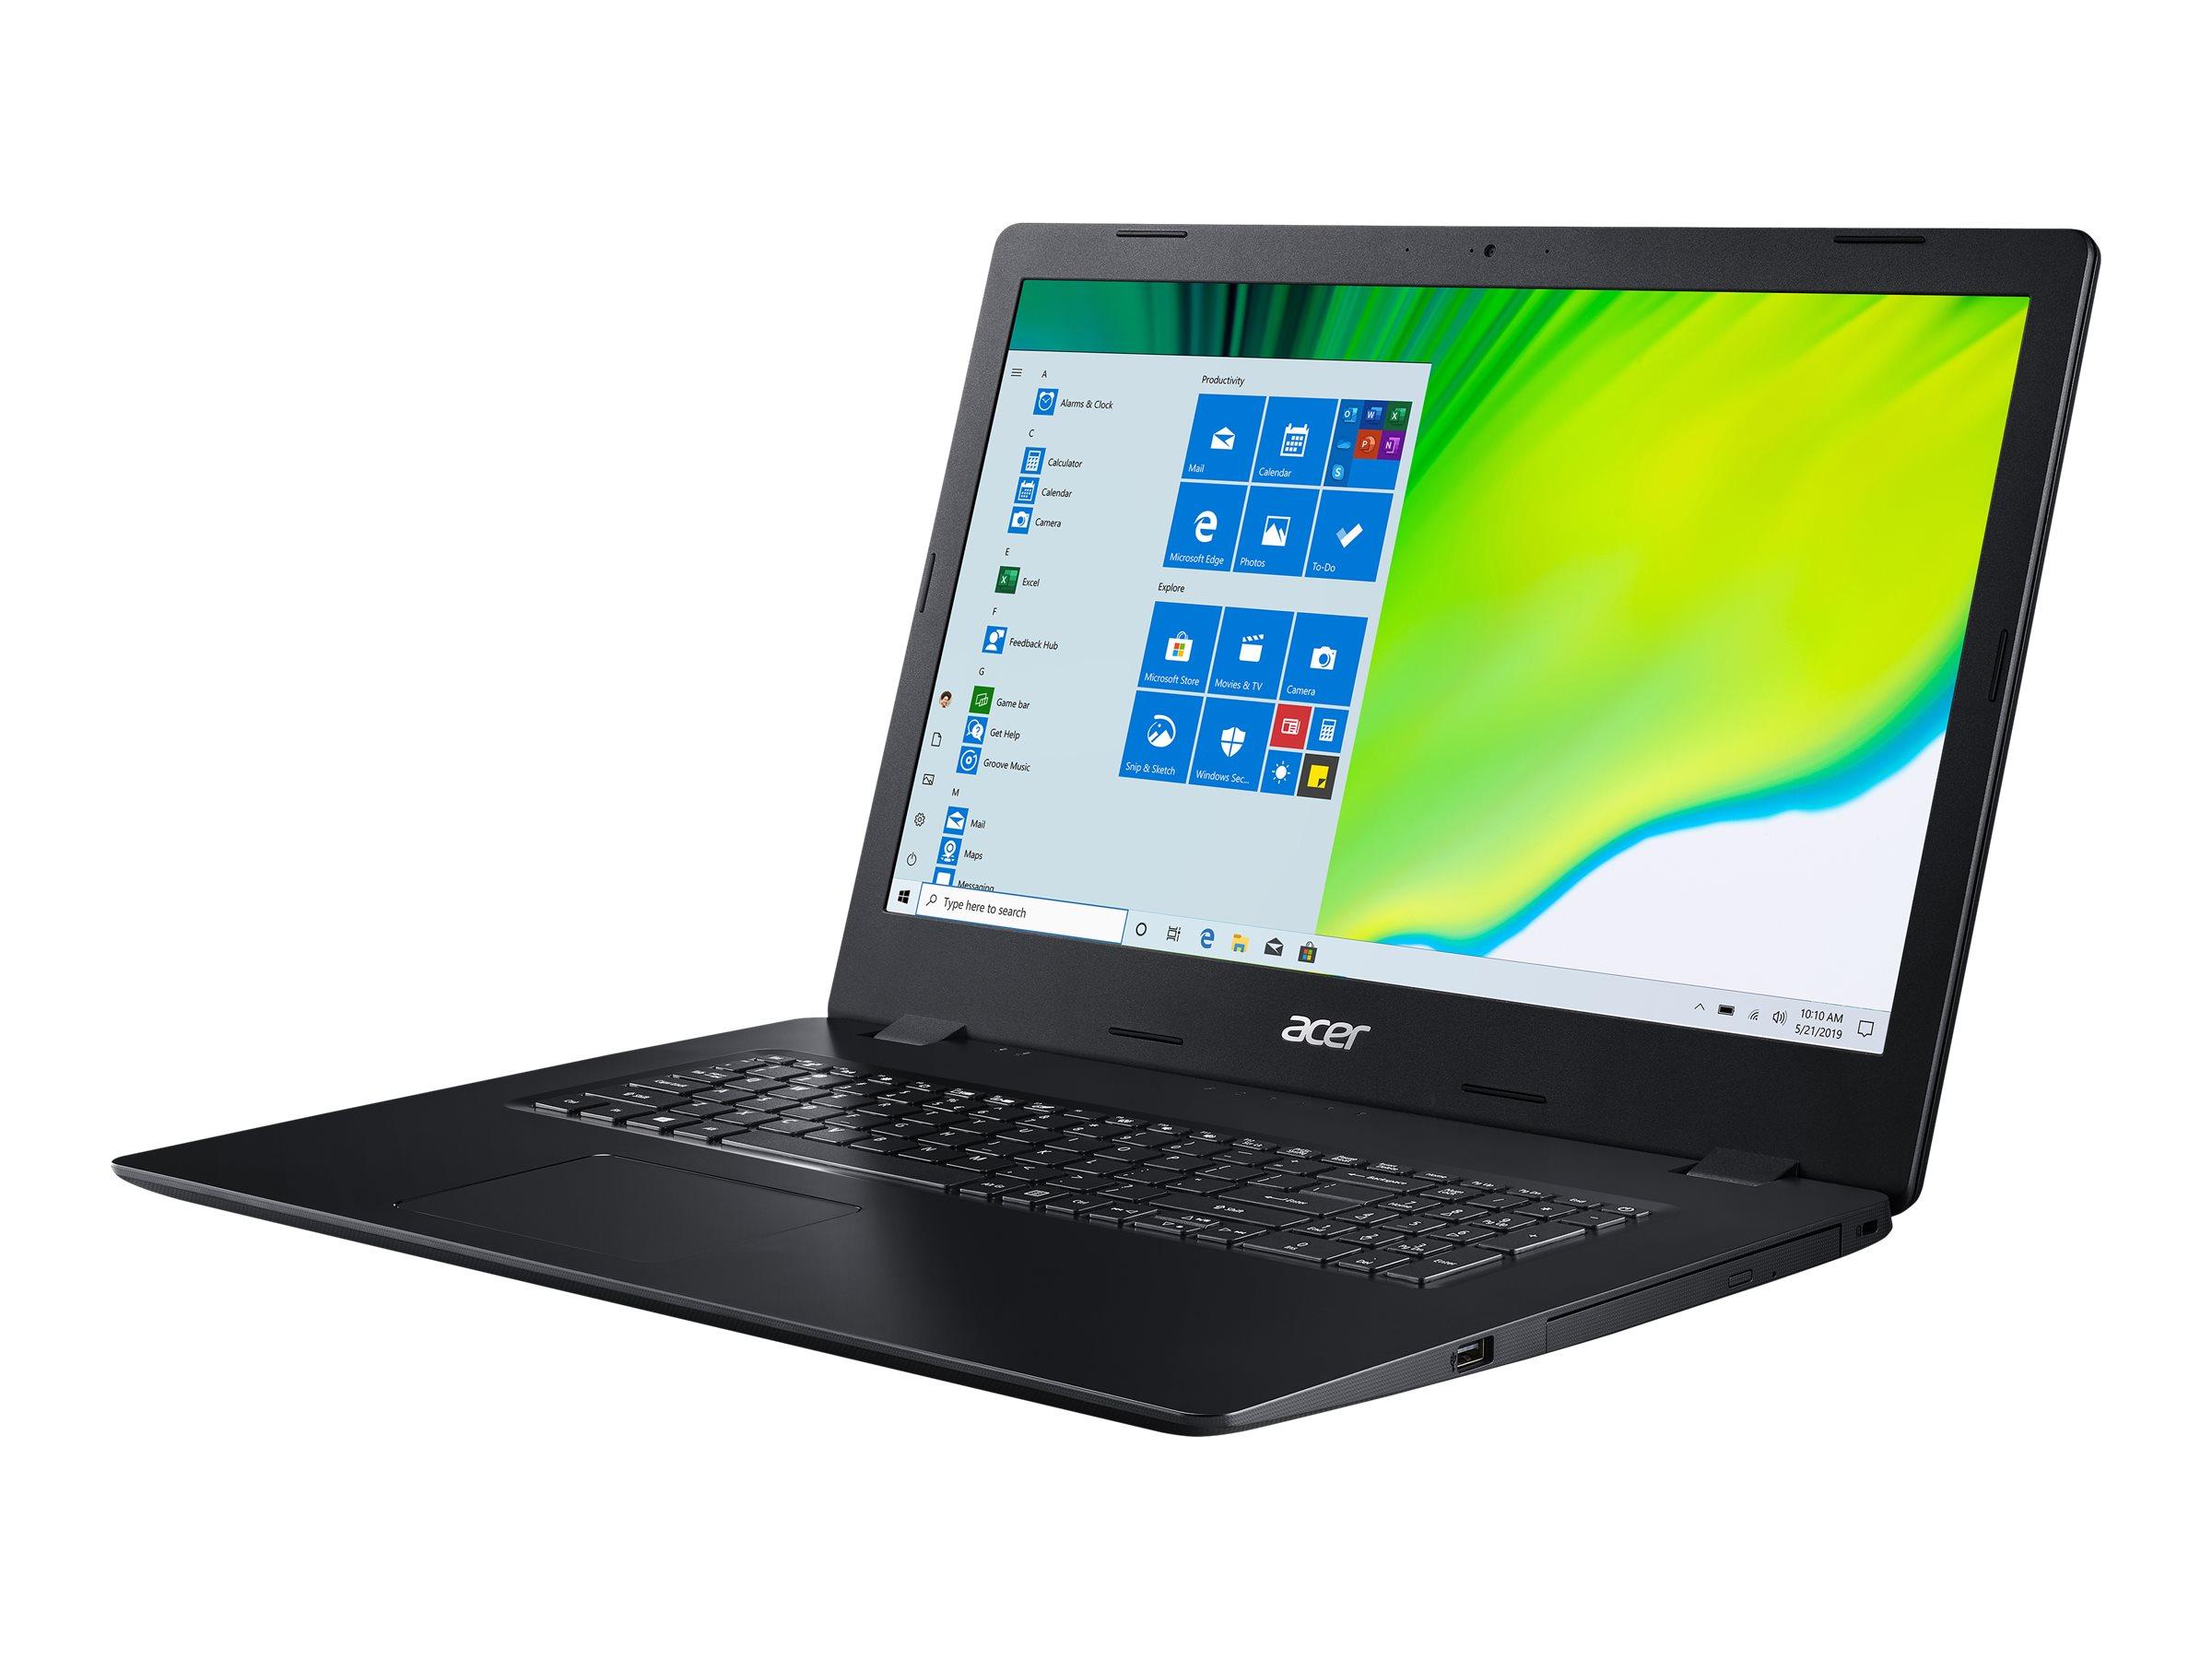 "Acer Aspire 3 A317-52-56FD - Core i5 1035G1 / 1 GHz - Win 10 Pro 64-Bit - 8 GB RAM - 512 GB SSD NVMe, QLC - DVD-Writer - 43.9 cm (17.3"")"